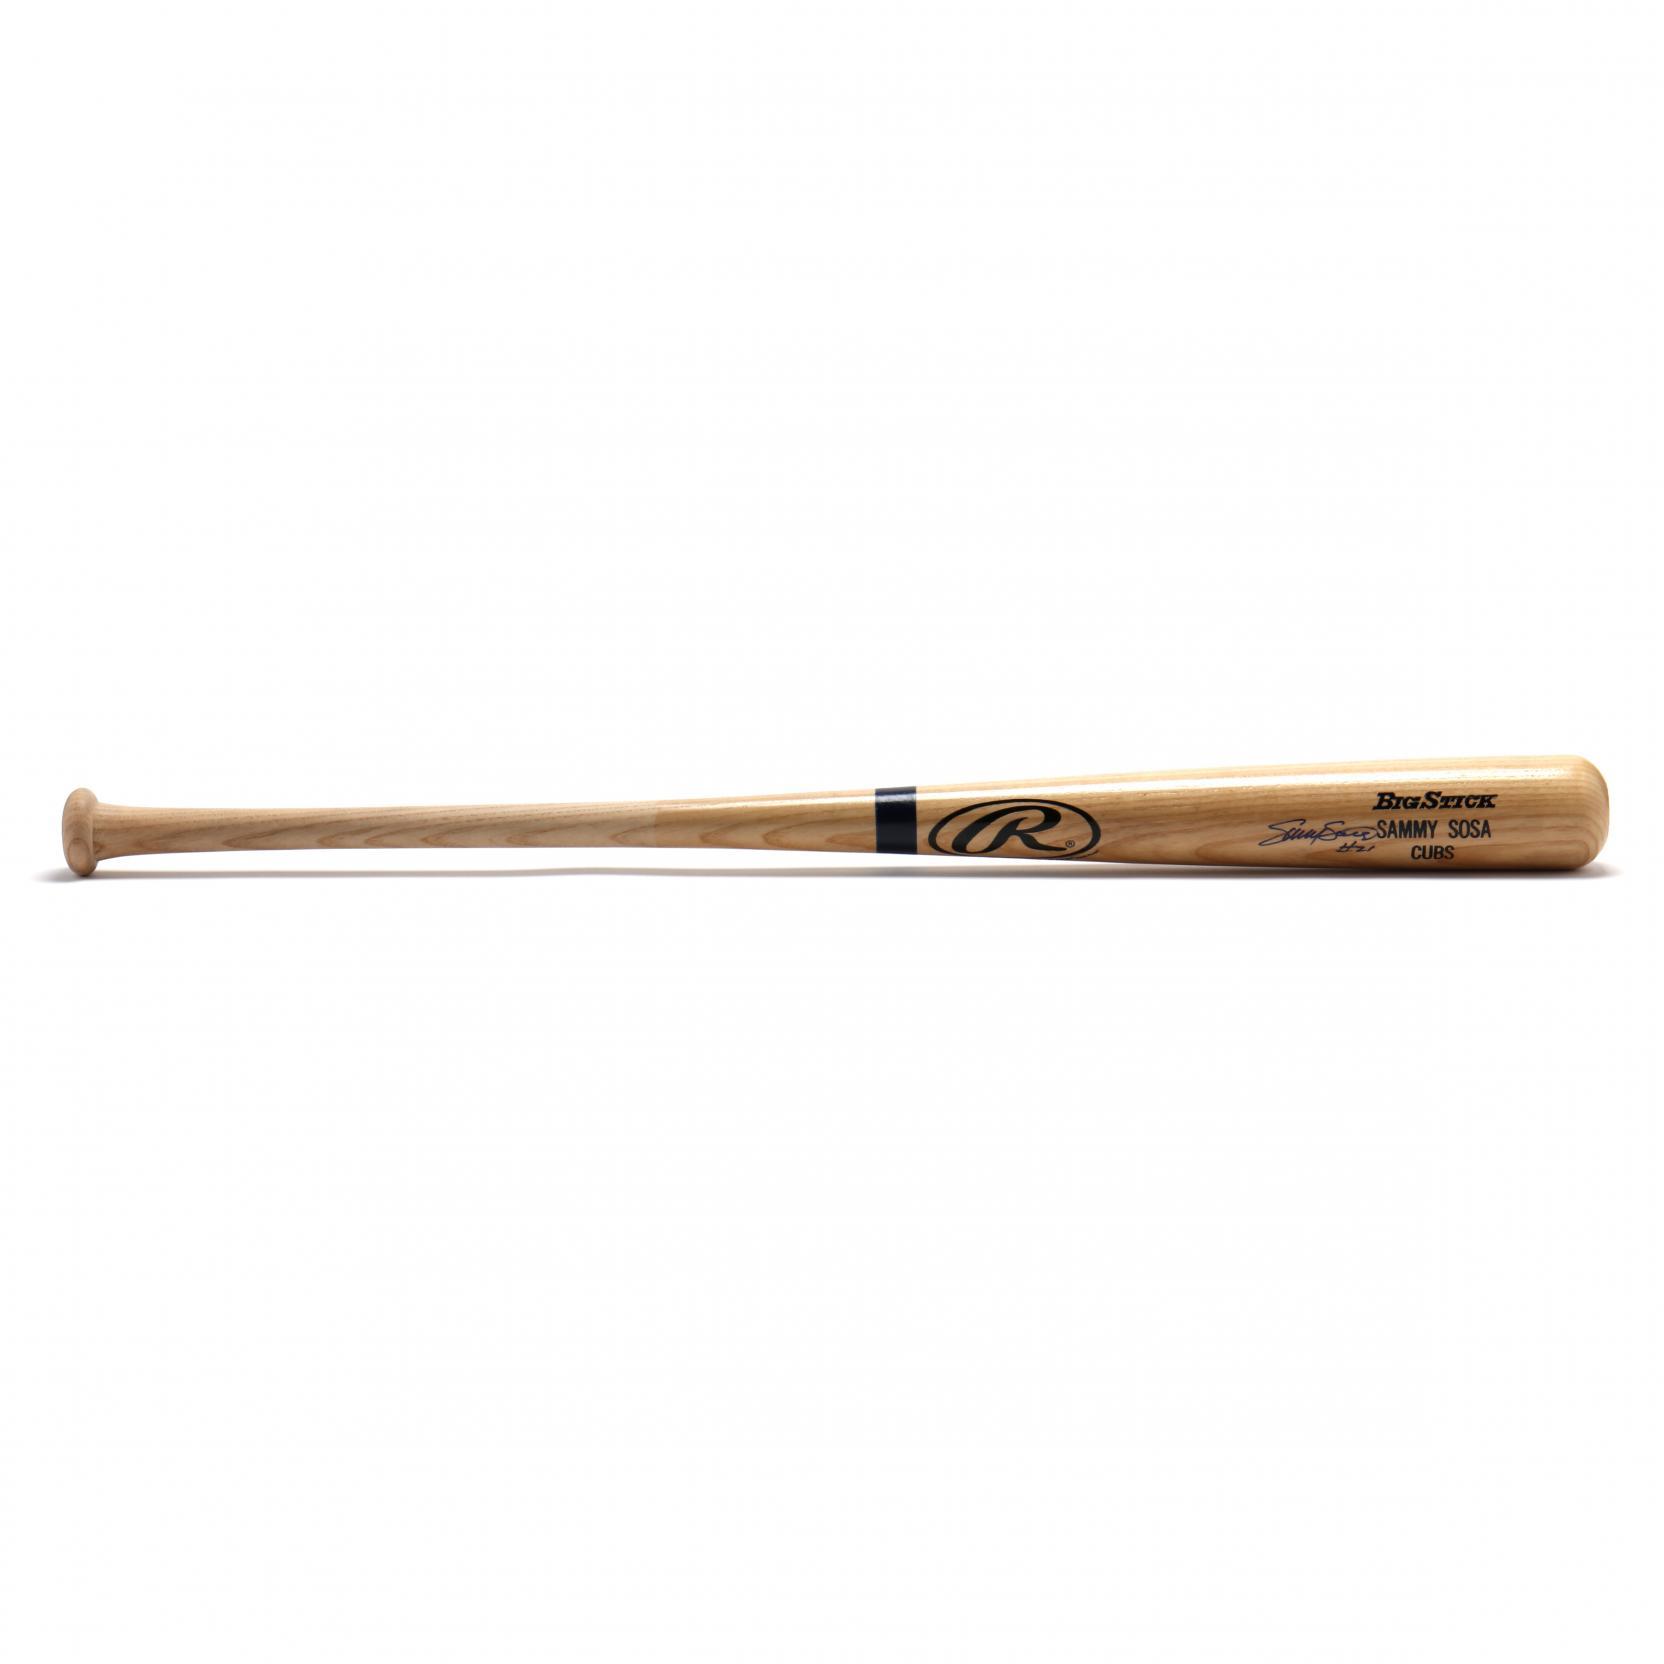 sammy-sosa-21-cubs-autographed-big-stick-bat